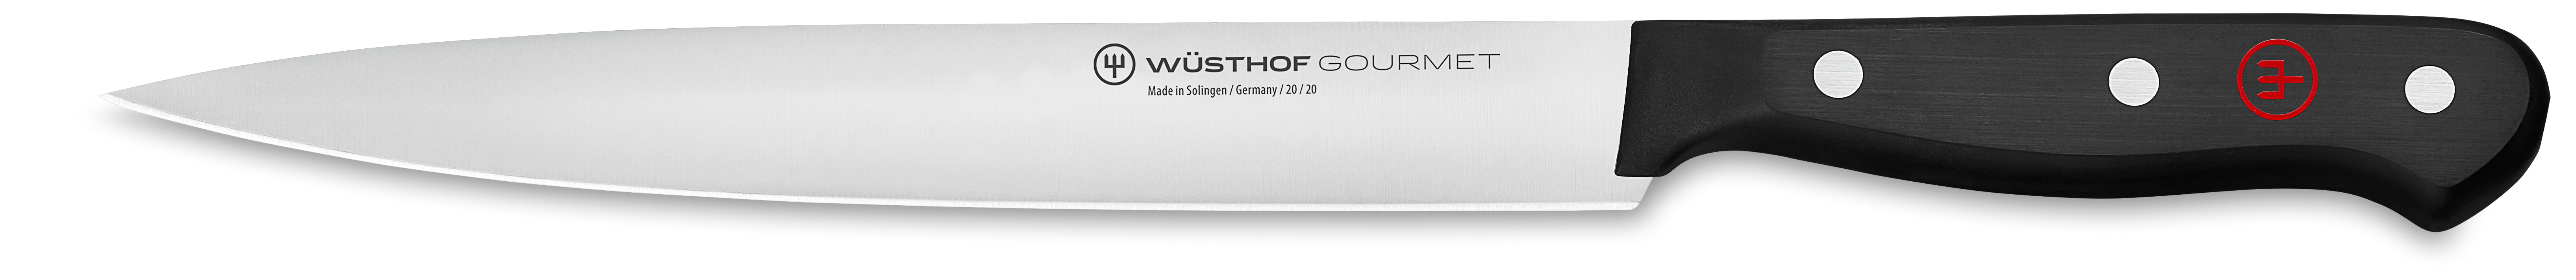 Wusthof Gourmet Carving Knife 20cm